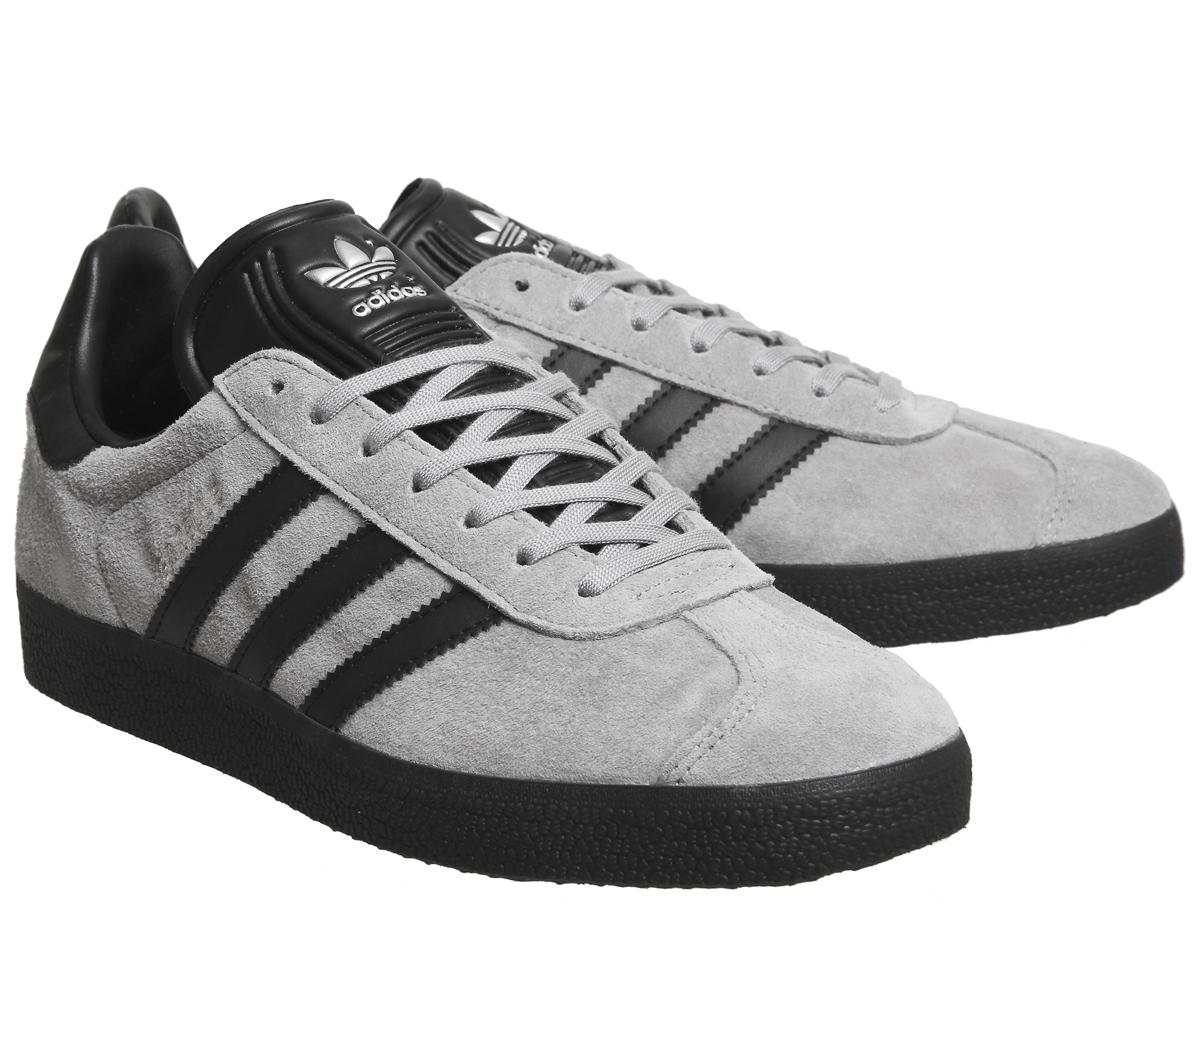 Uomo BLACK Adidas Gazelle Trainers GREY BLACK Uomo EXCLUSIVE Trainers Schuhes 8fc843